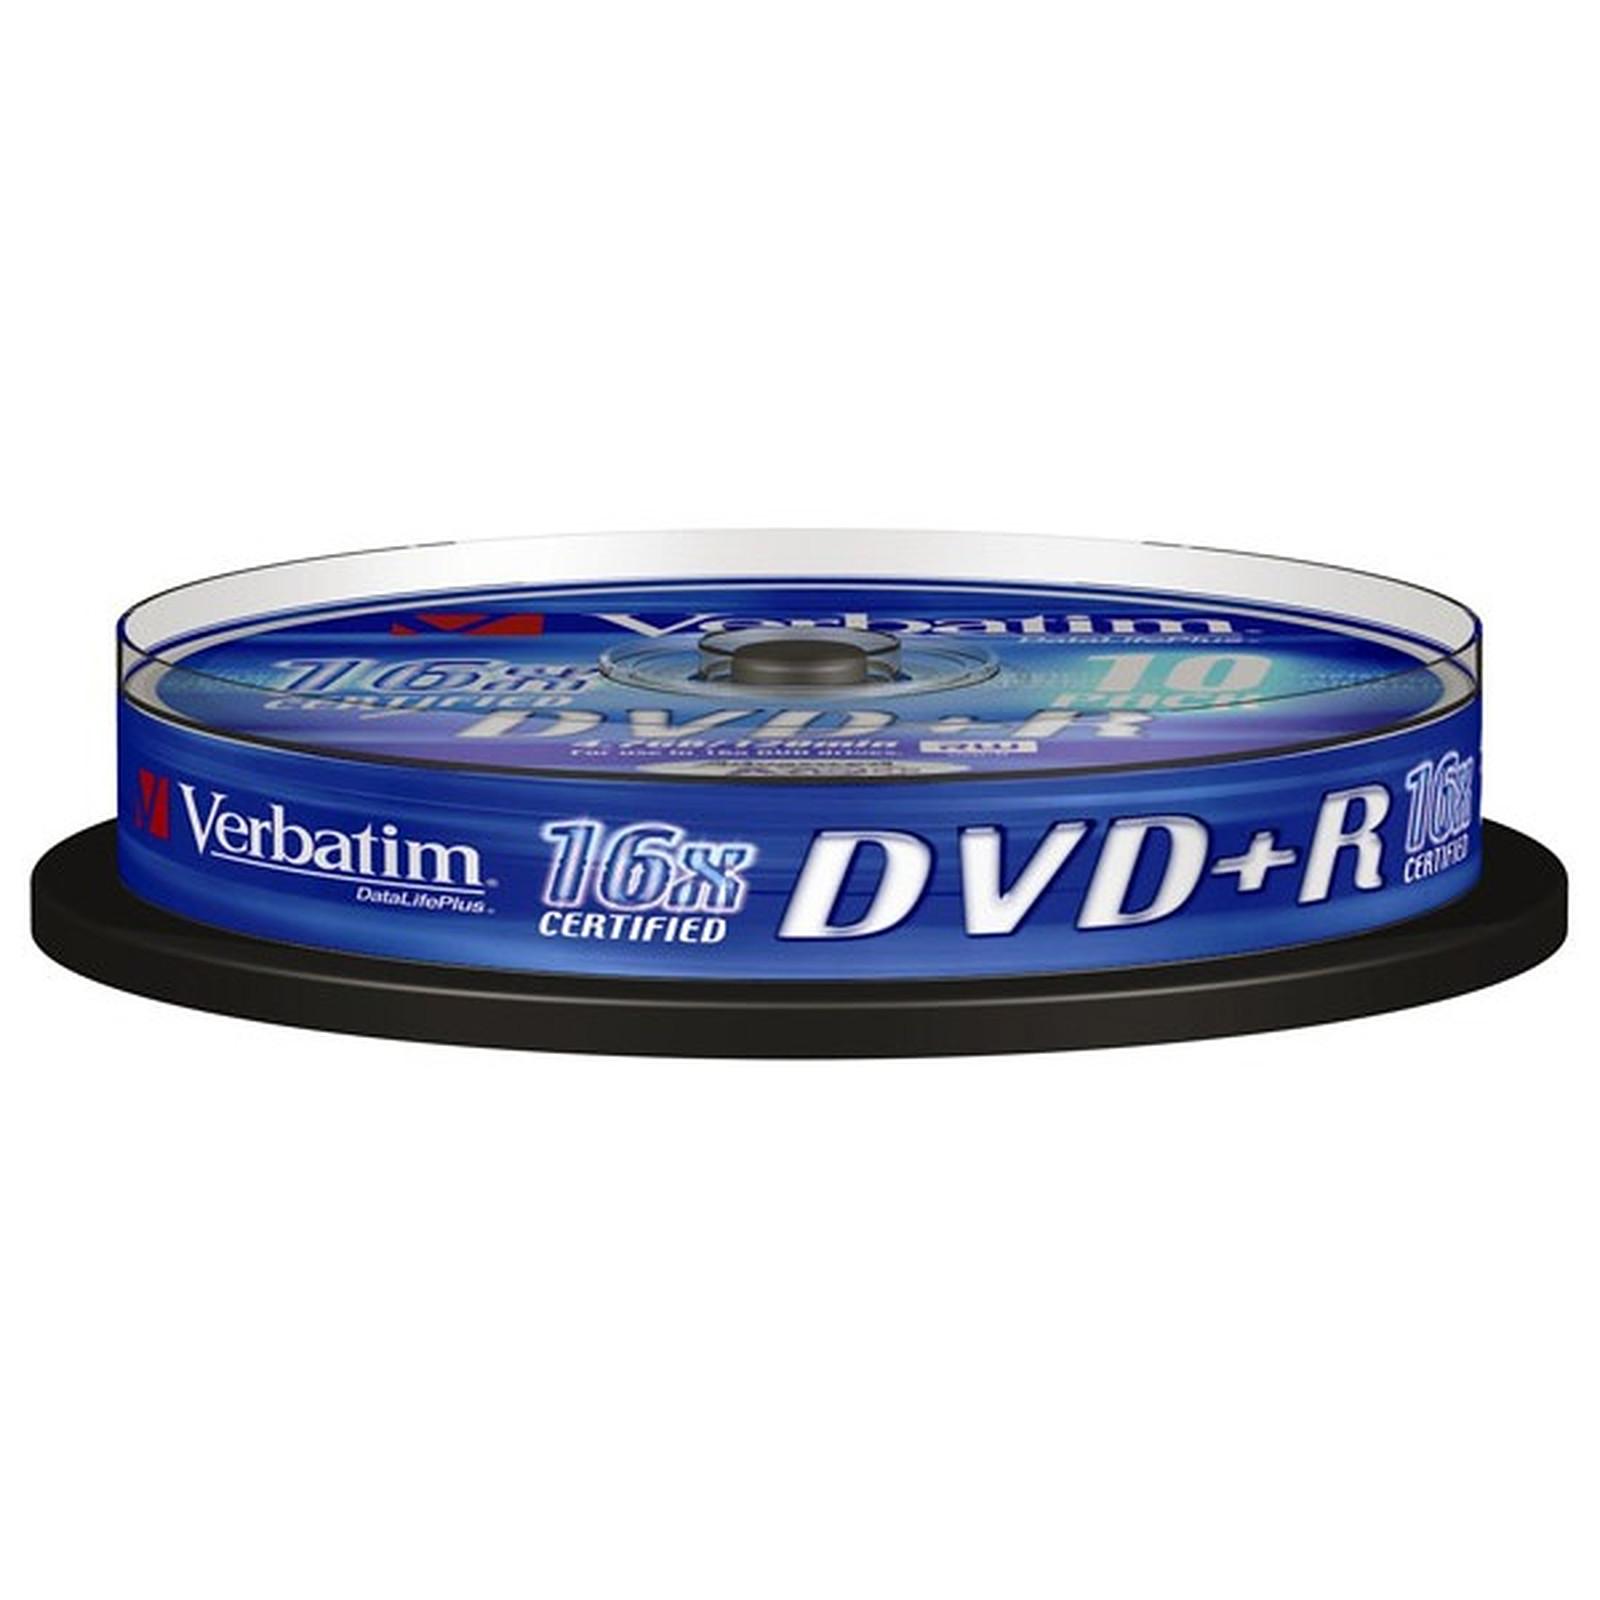 Verbatim DVD+R 4.7 Go 16x (par 10, spindle)